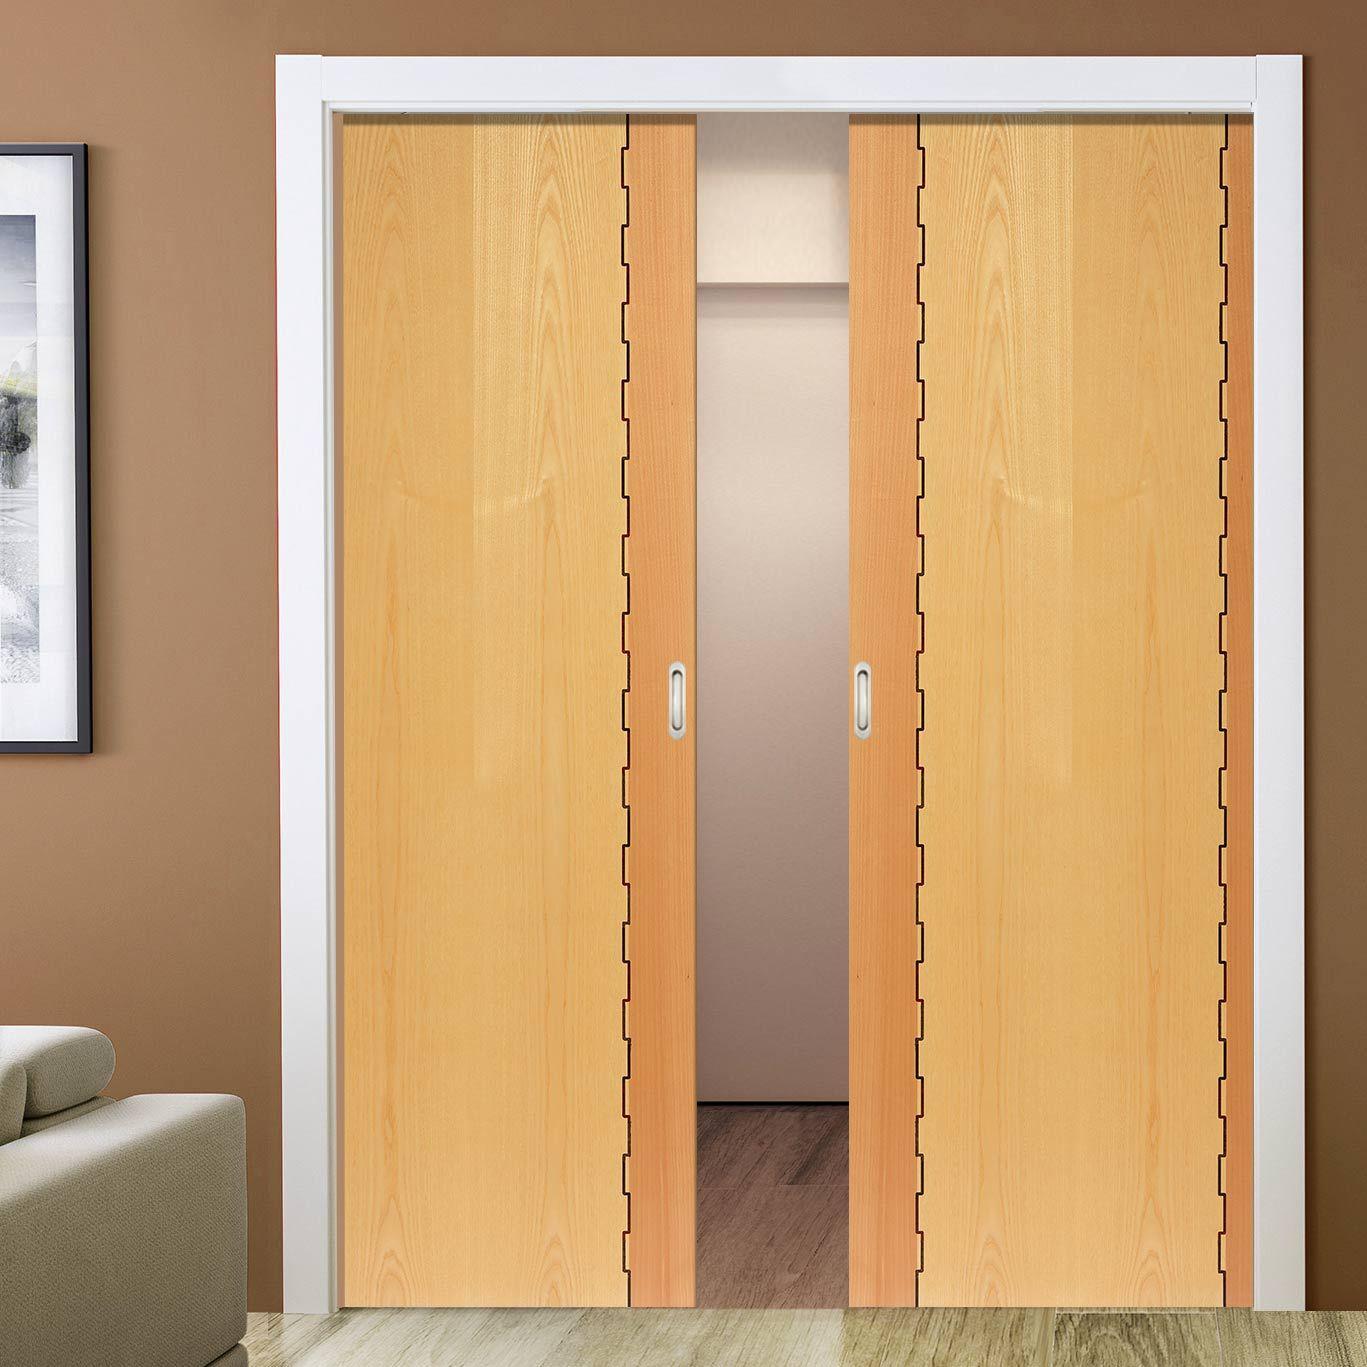 Double pocket empire honduras beech u oak sliding door system in